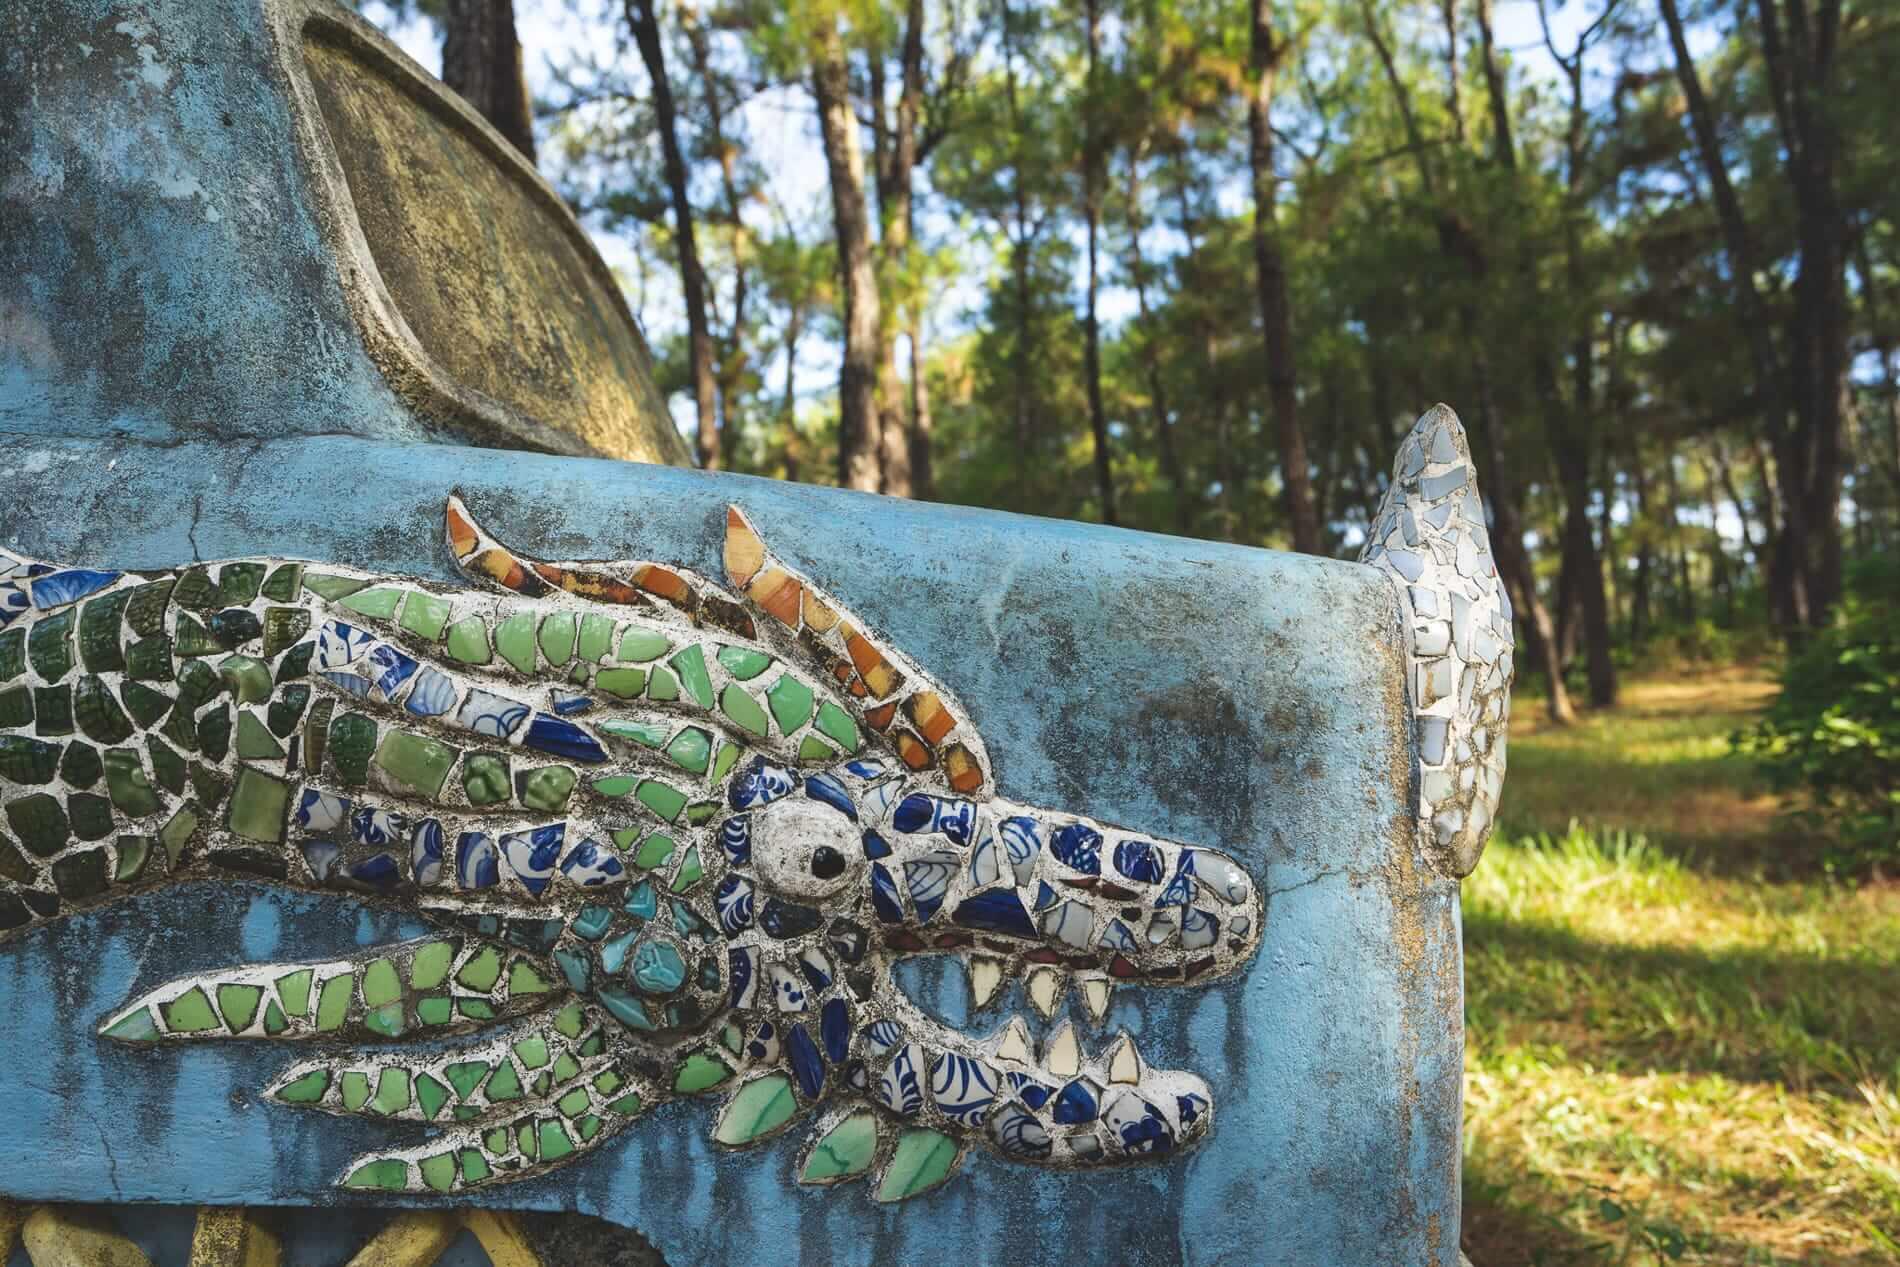 Old car in graffiti - Hue's Abandoned Water Park